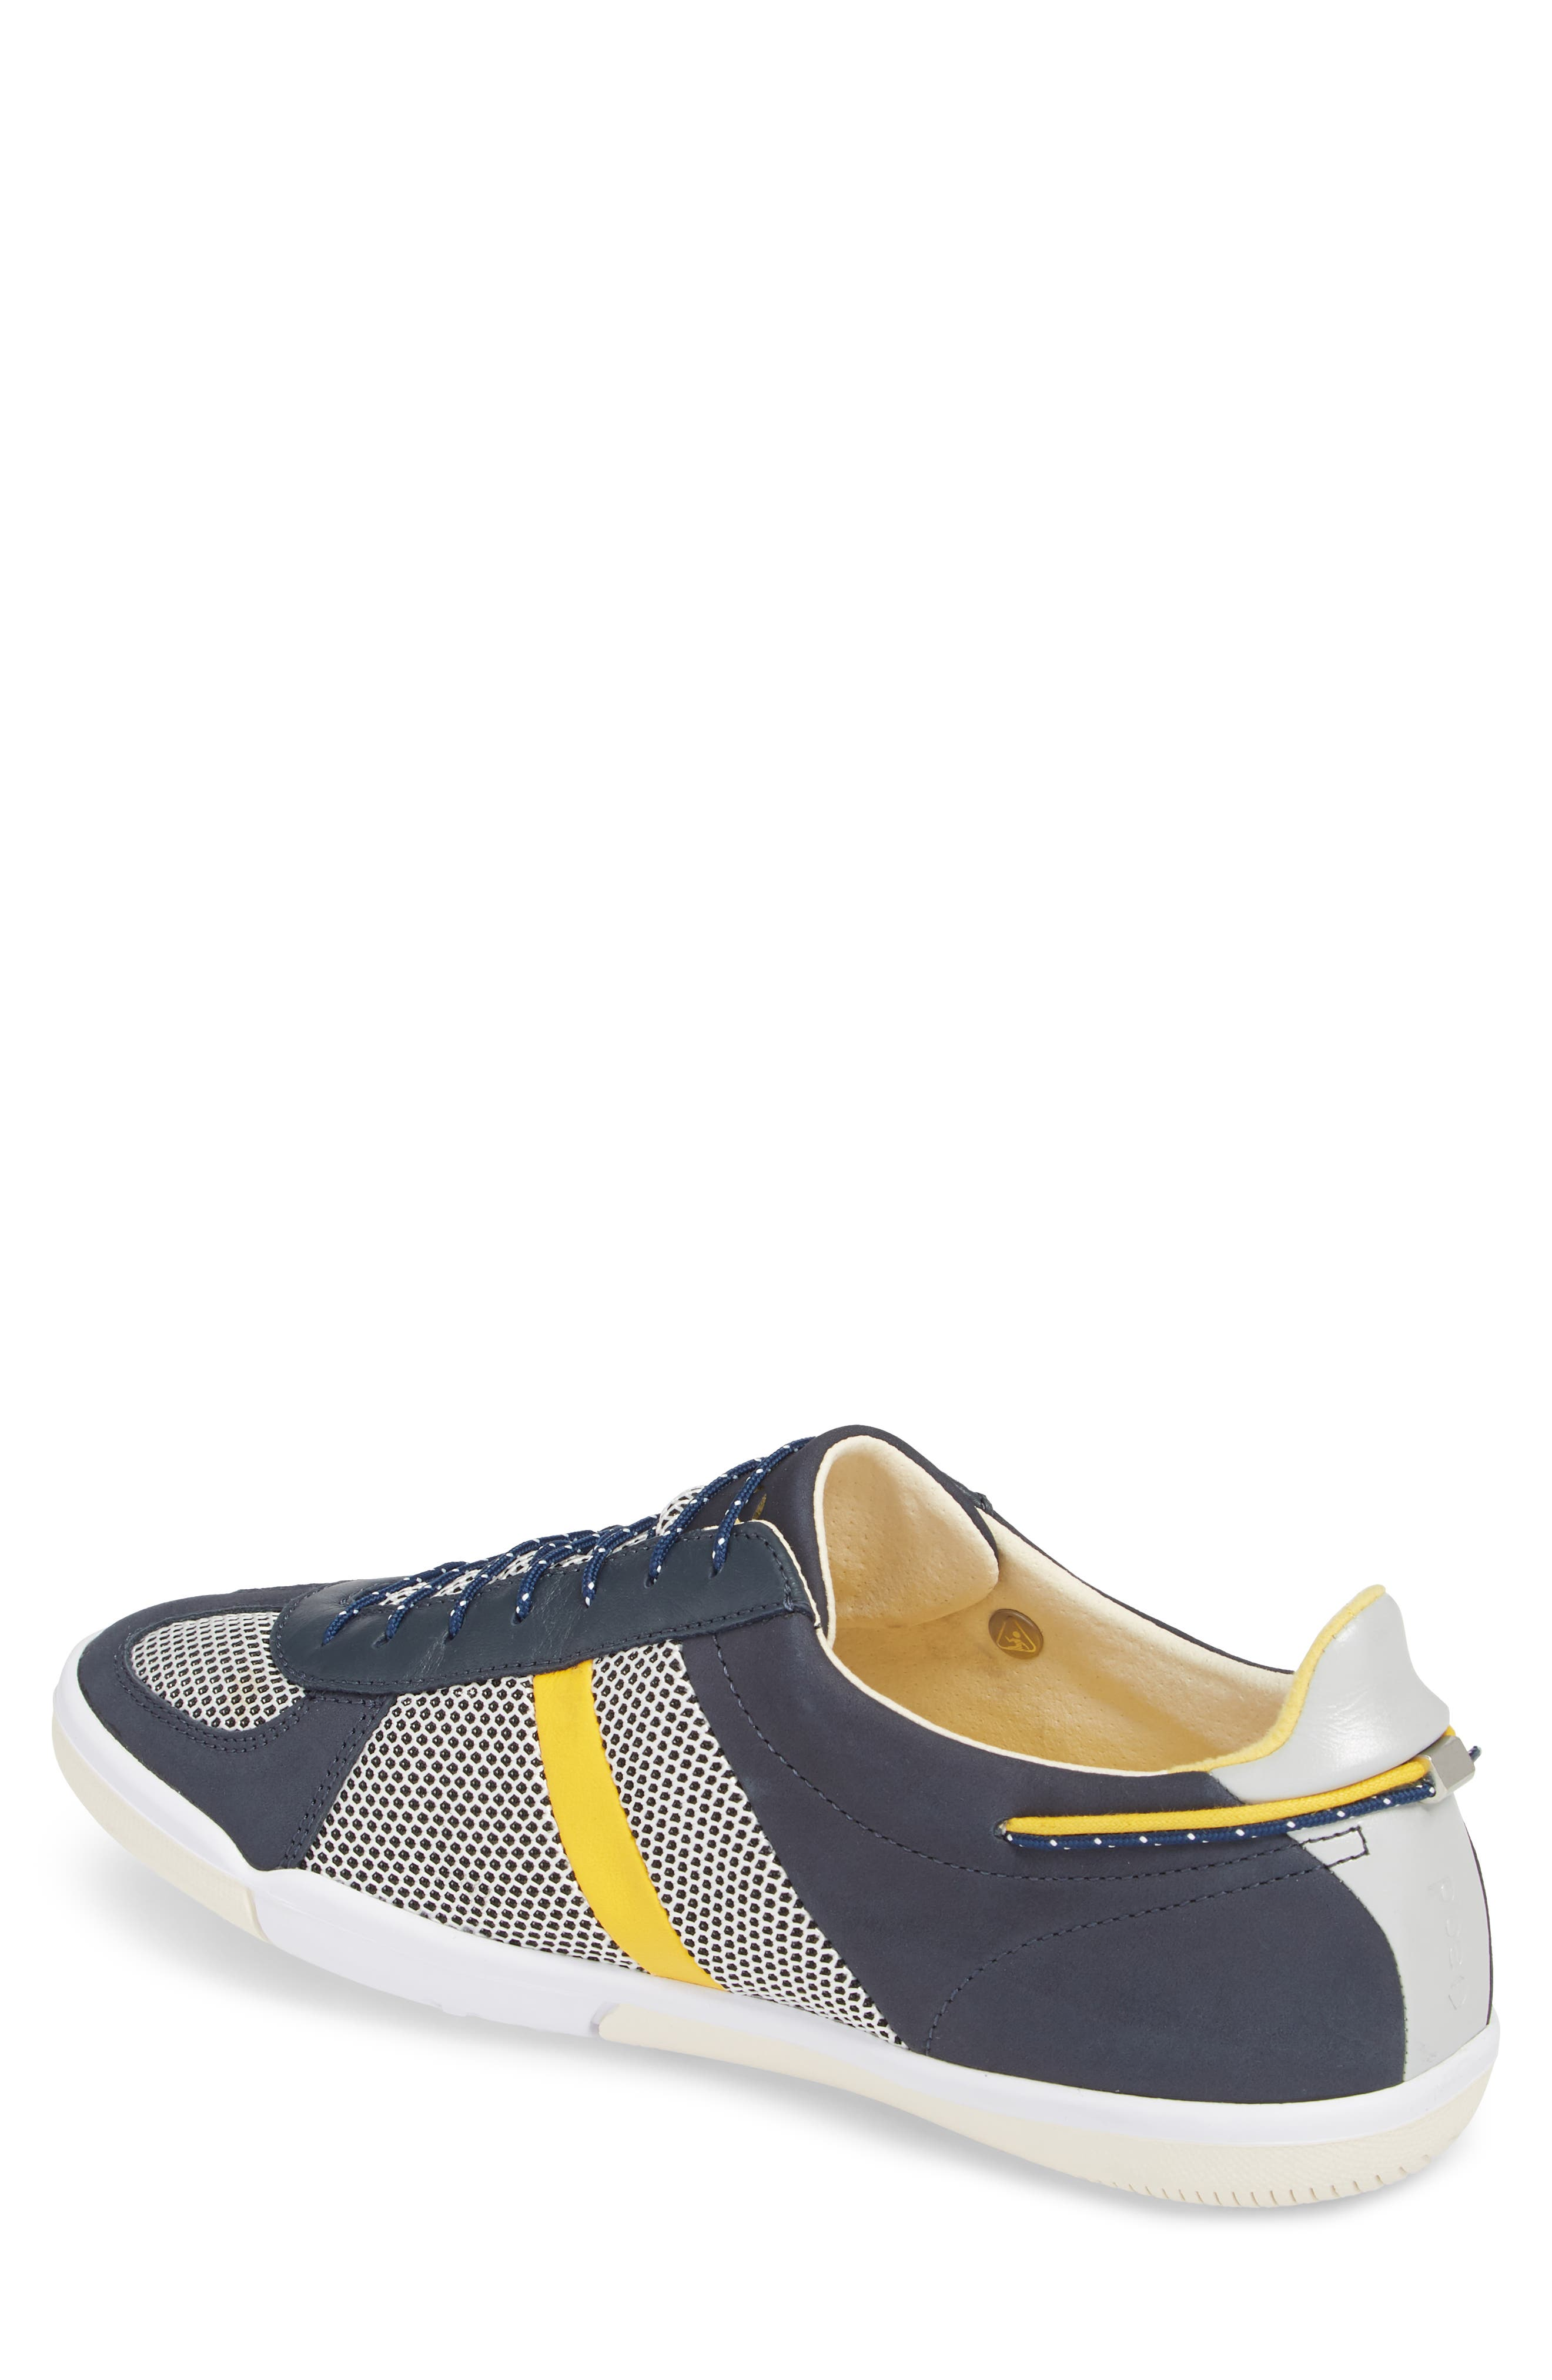 Alternate Image 2  - PLAE Butler Low-Top Sneaker (Men)